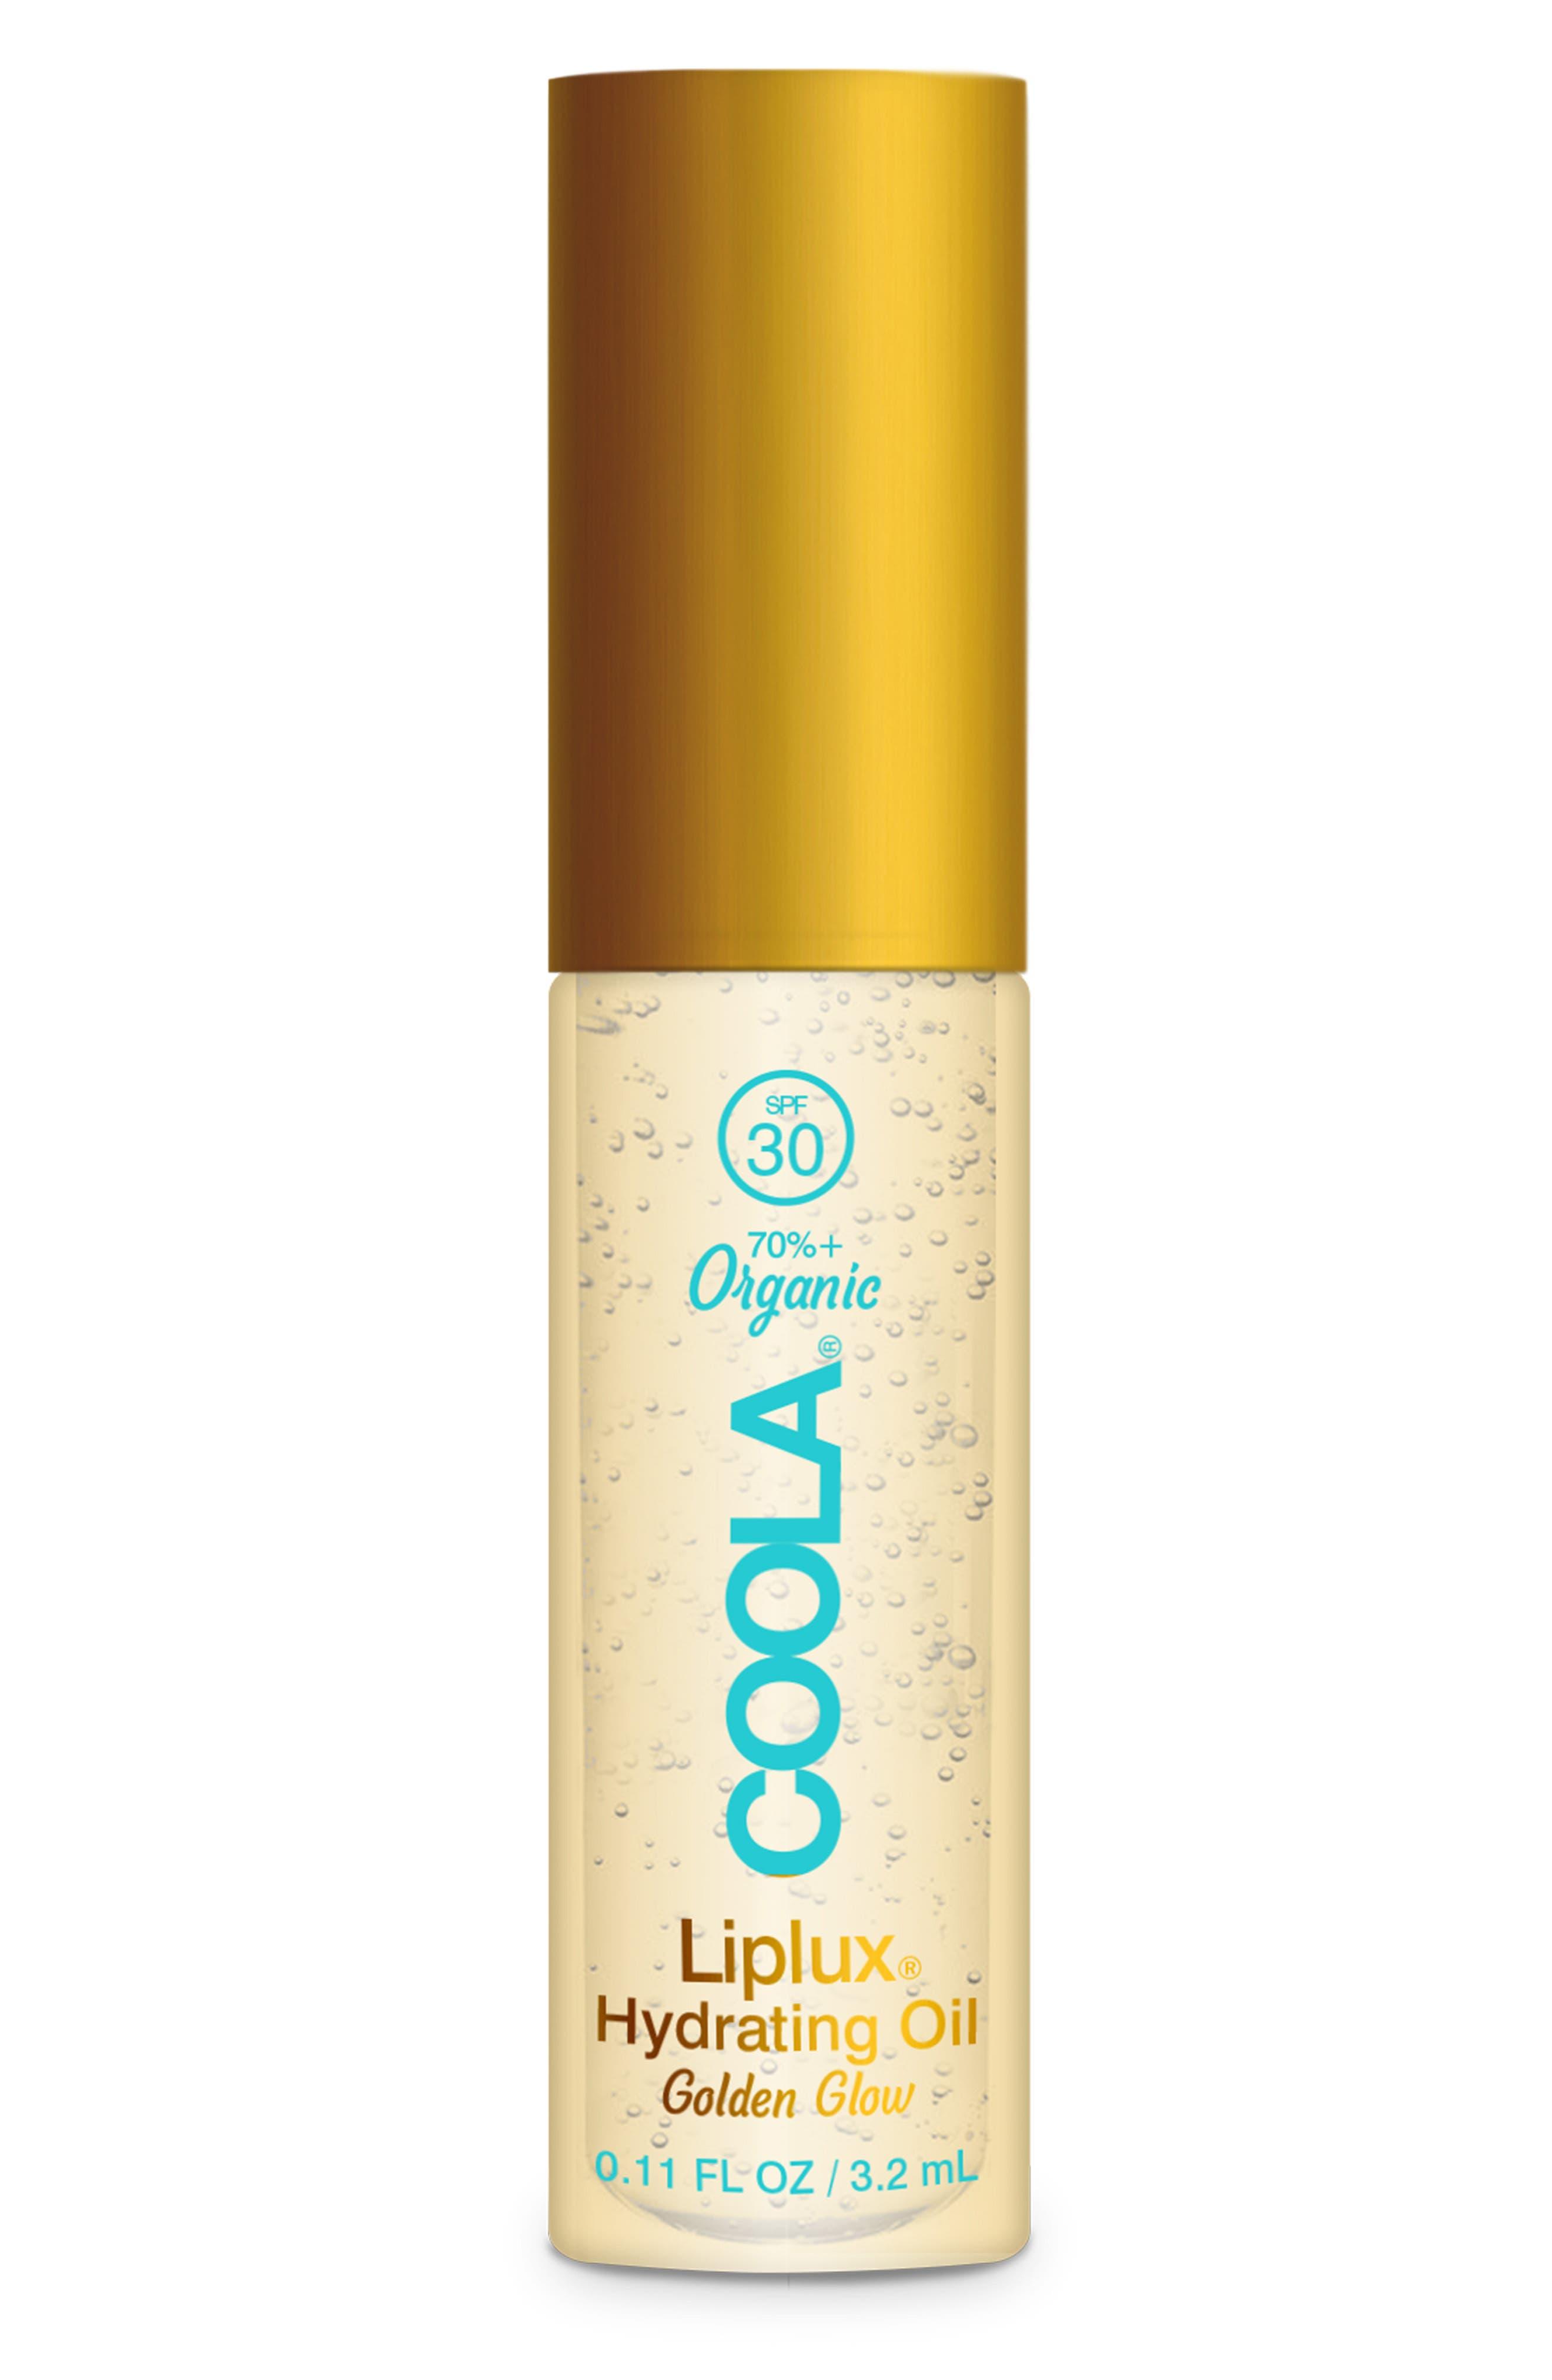 Classic Liplux® Organic Hydrating Lip Oil Sunscreen SPF 30 | Nordstrom